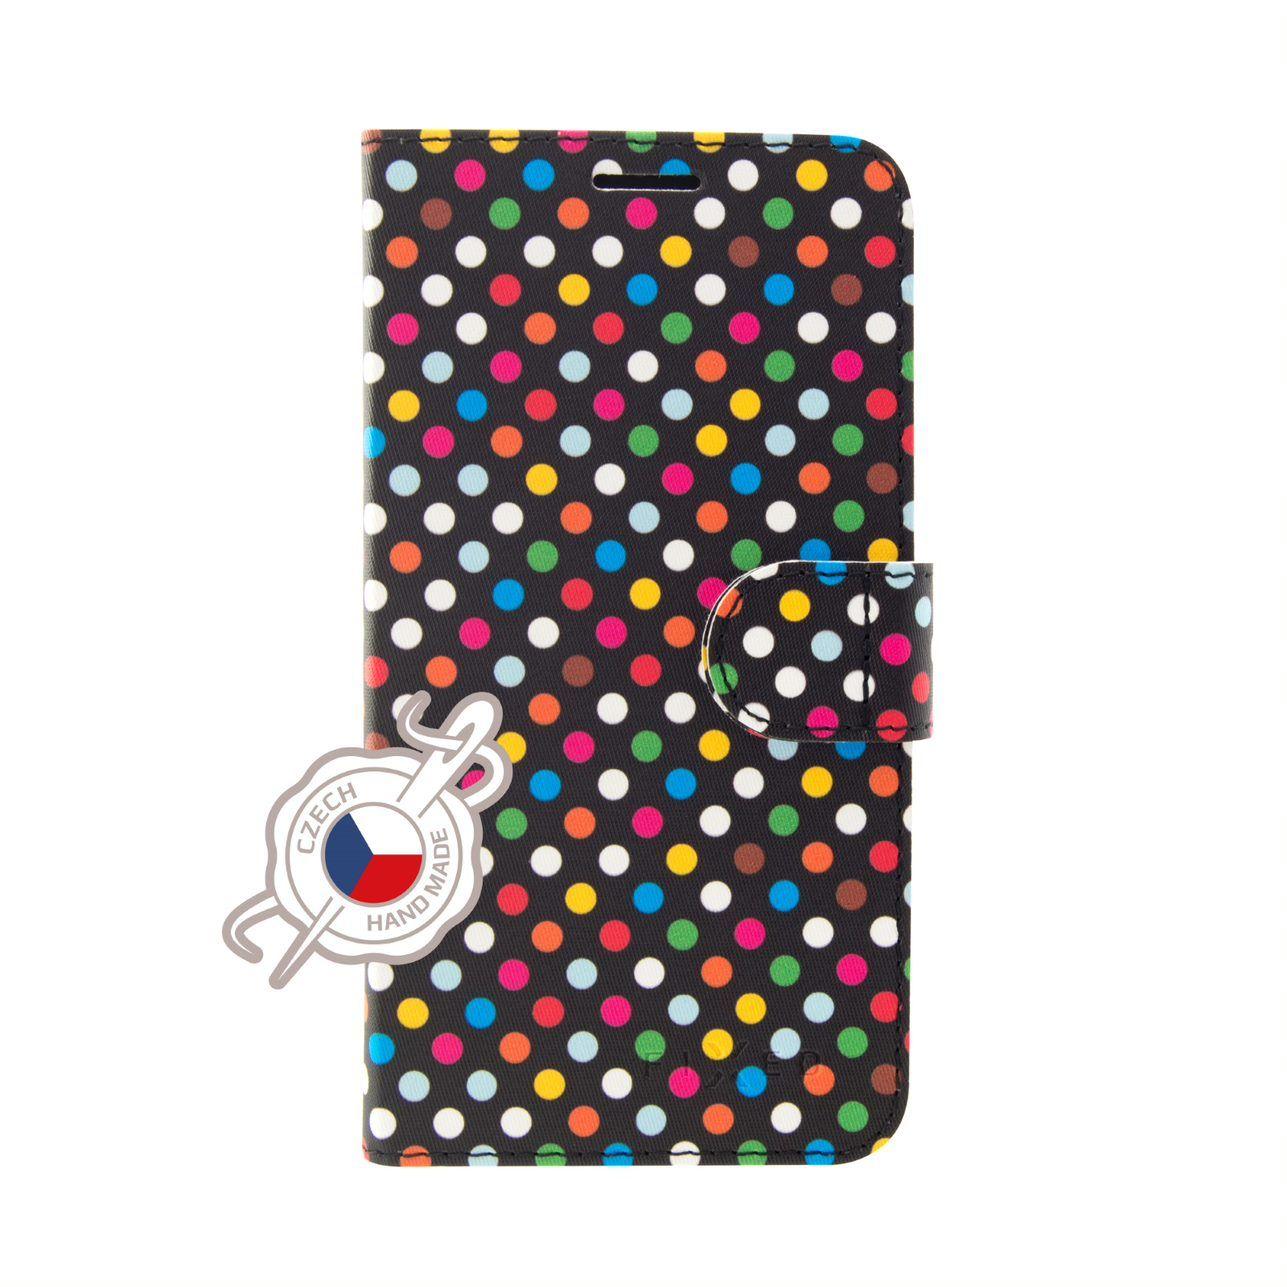 FIXED FIT flipové pouzdro pro Samsung Galaxy Xcover 4/4S, motiv Rainbow Dots